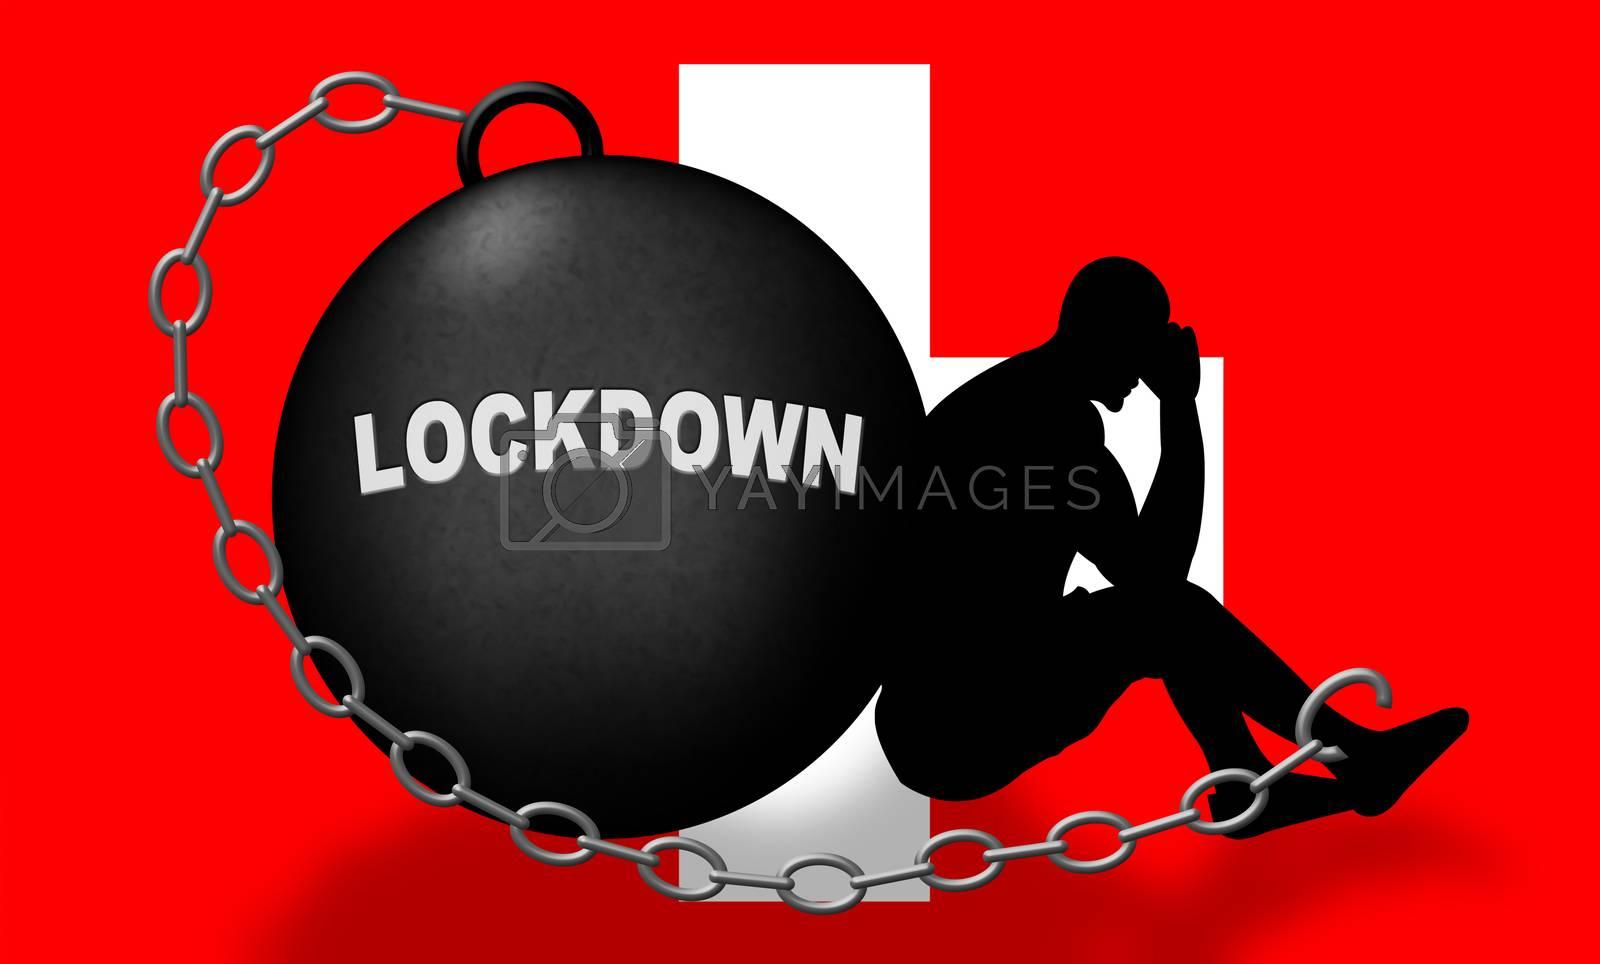 Switzerland lockdown preventing coronavirus pandemic outbreak. Covid 19 Swiss precaution to lock down disease infection - 3d Illustration